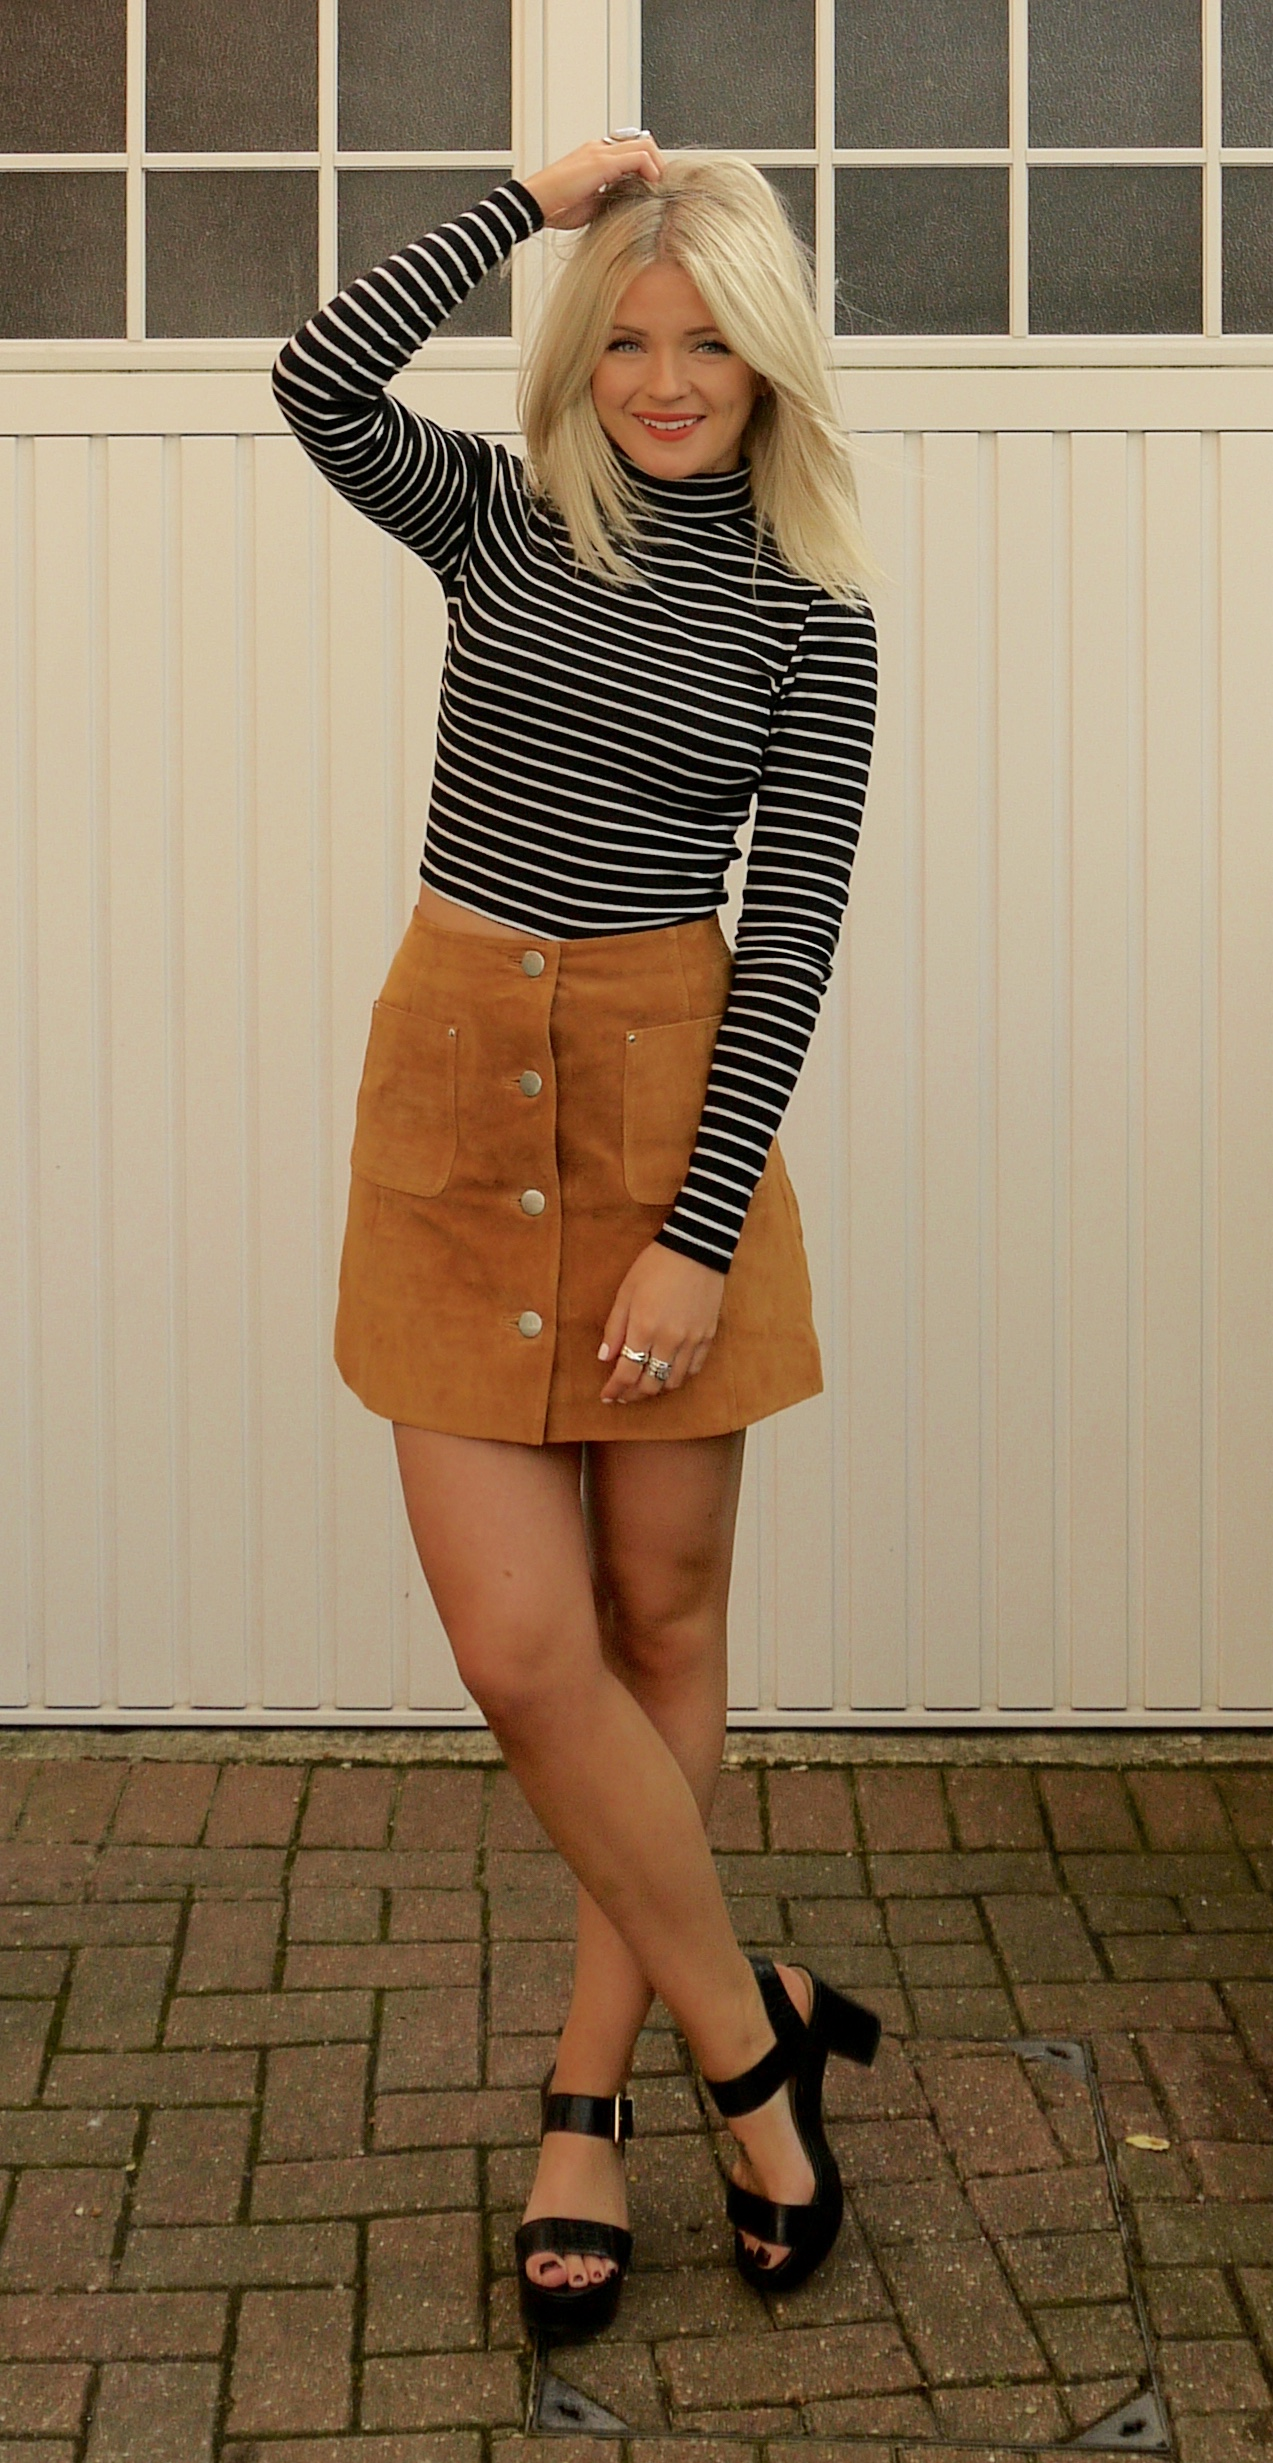 lauras little locket, laura byrnes, fashion blogger, tan suede a-line skirt, strip crop top, black new look sandals, 70s trend, a-line skirt